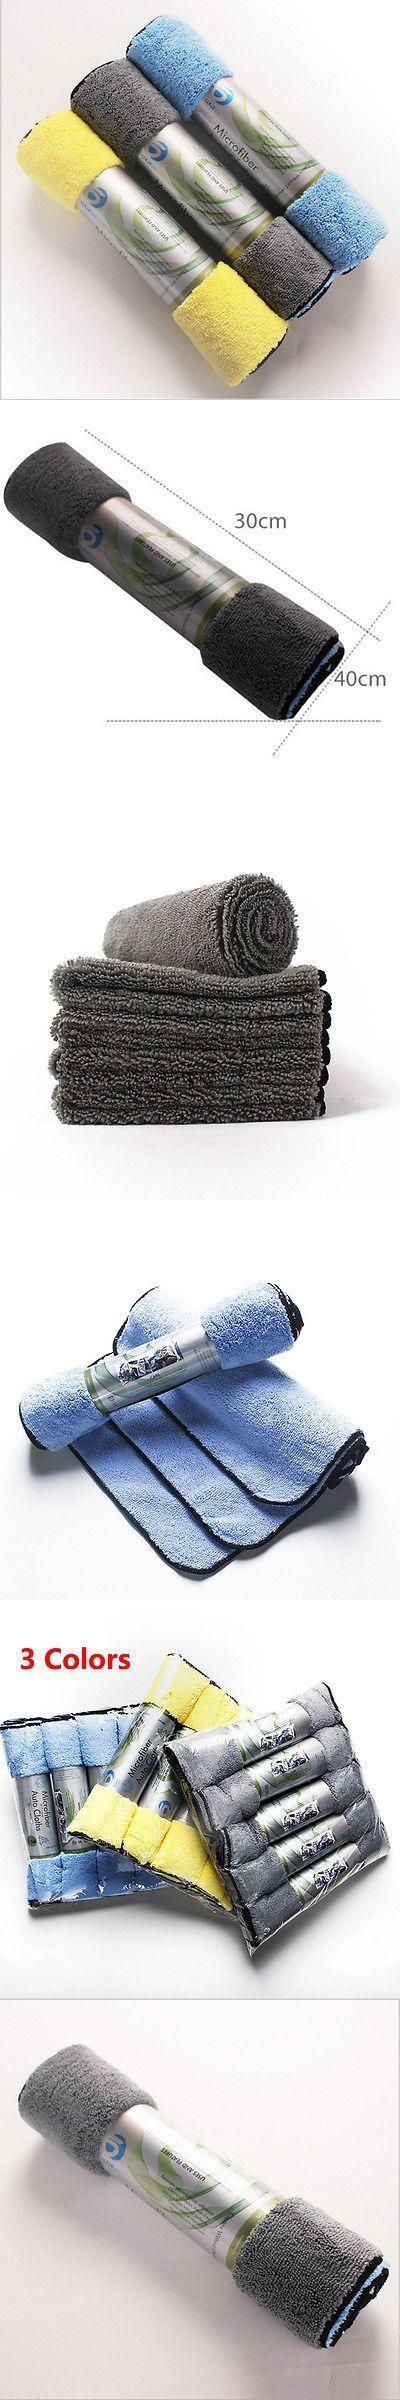 Hot 15Pcs Microfiber Cleaning Cloth Set Towel Rag Car Polishing No Scratch Detailing